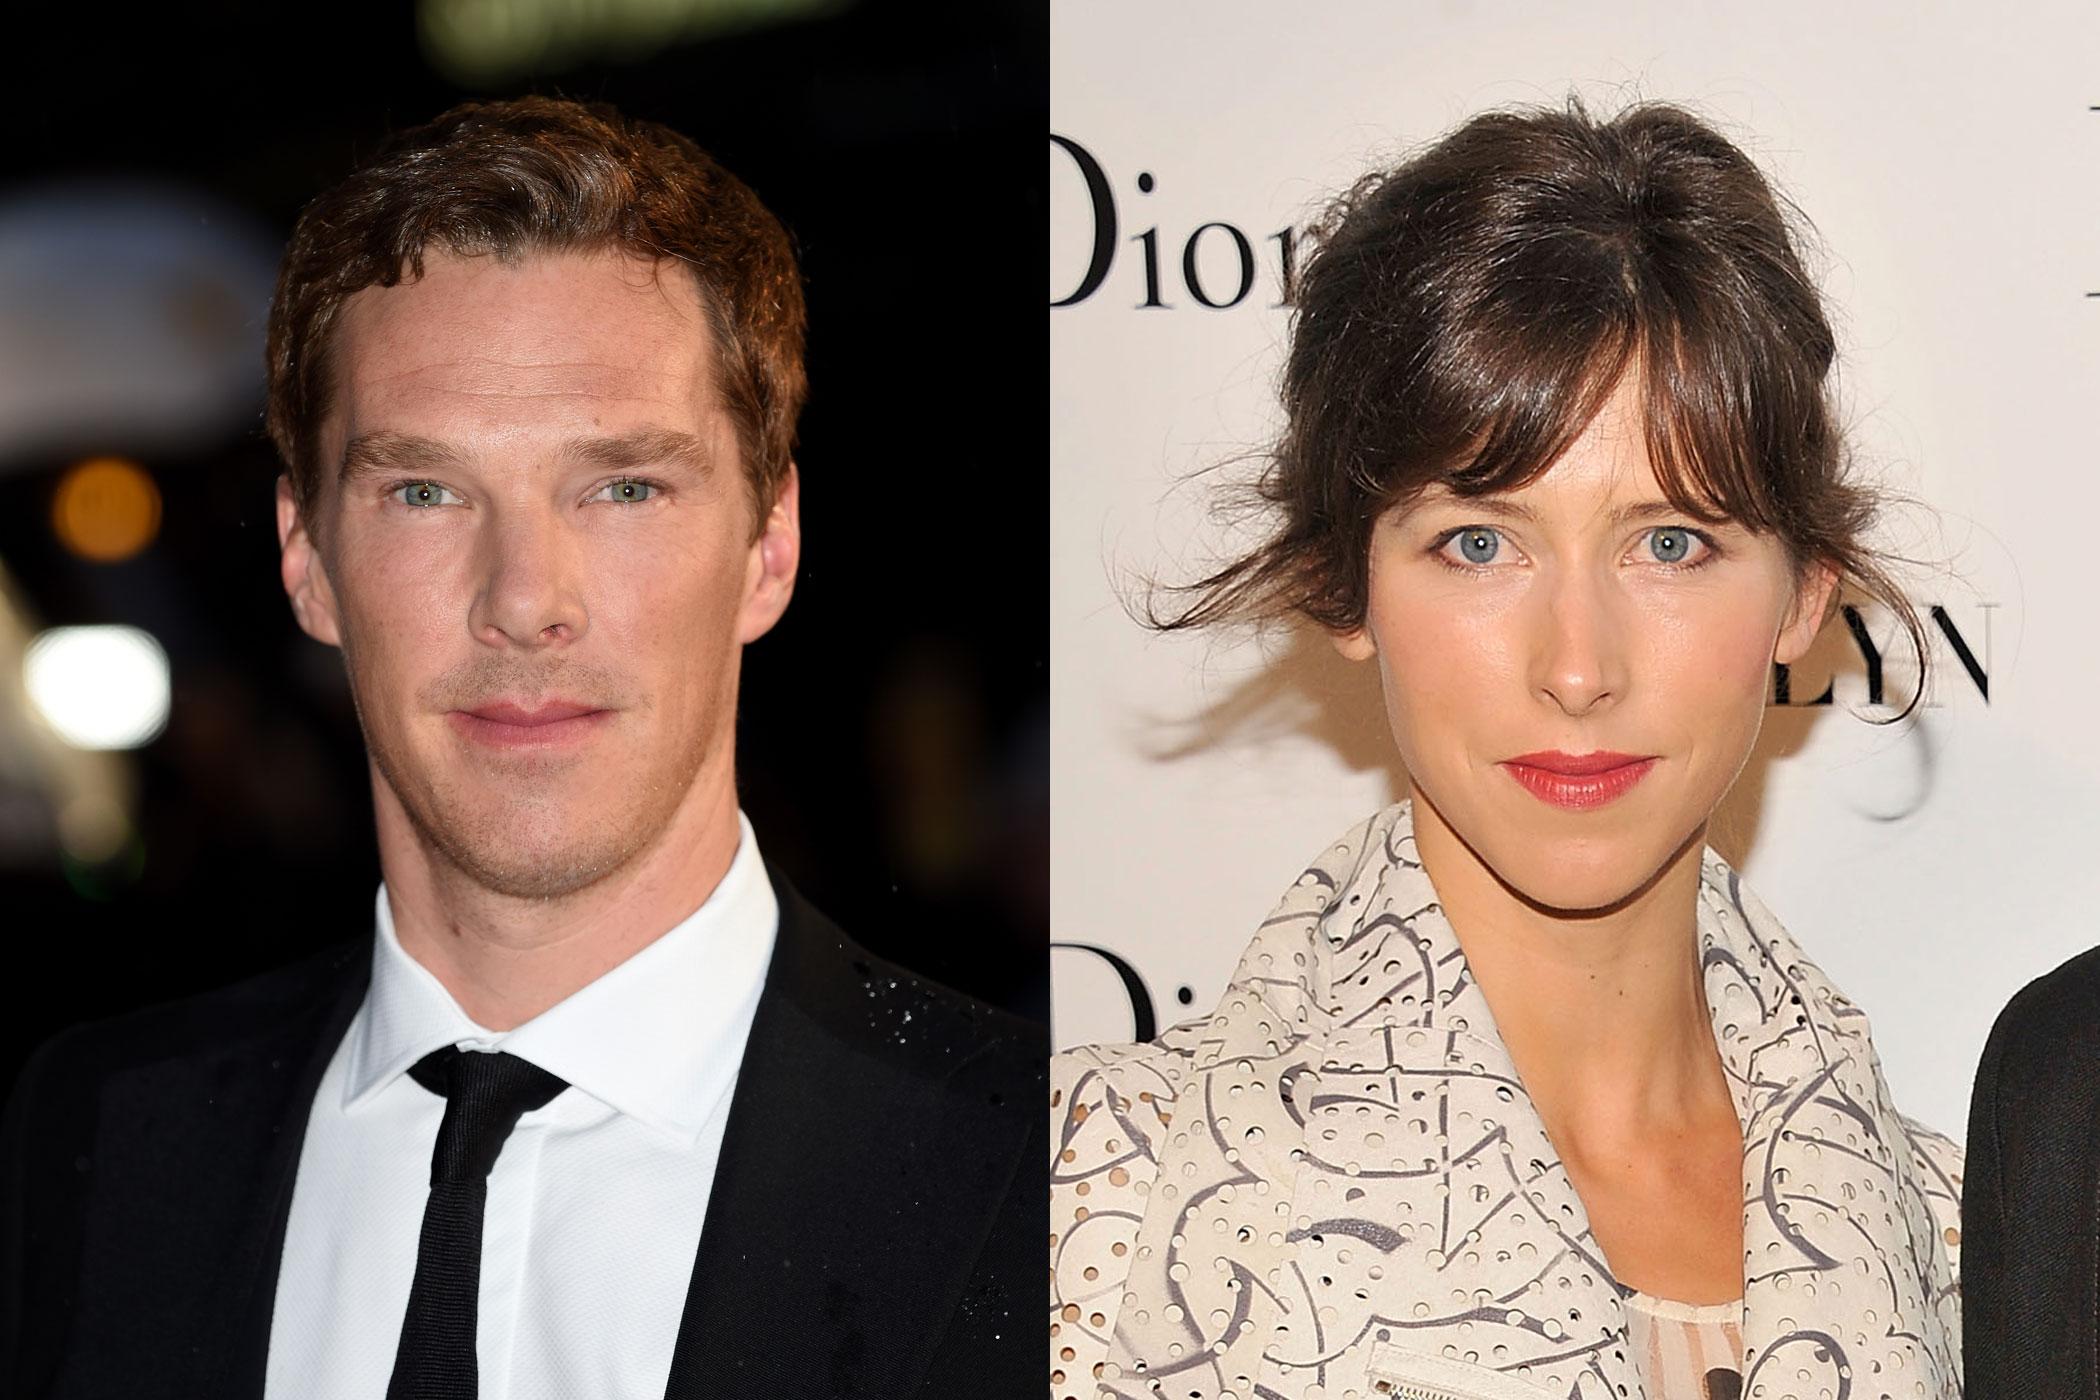 Benedict Cumberbatch and fiancée Sophie Hunter